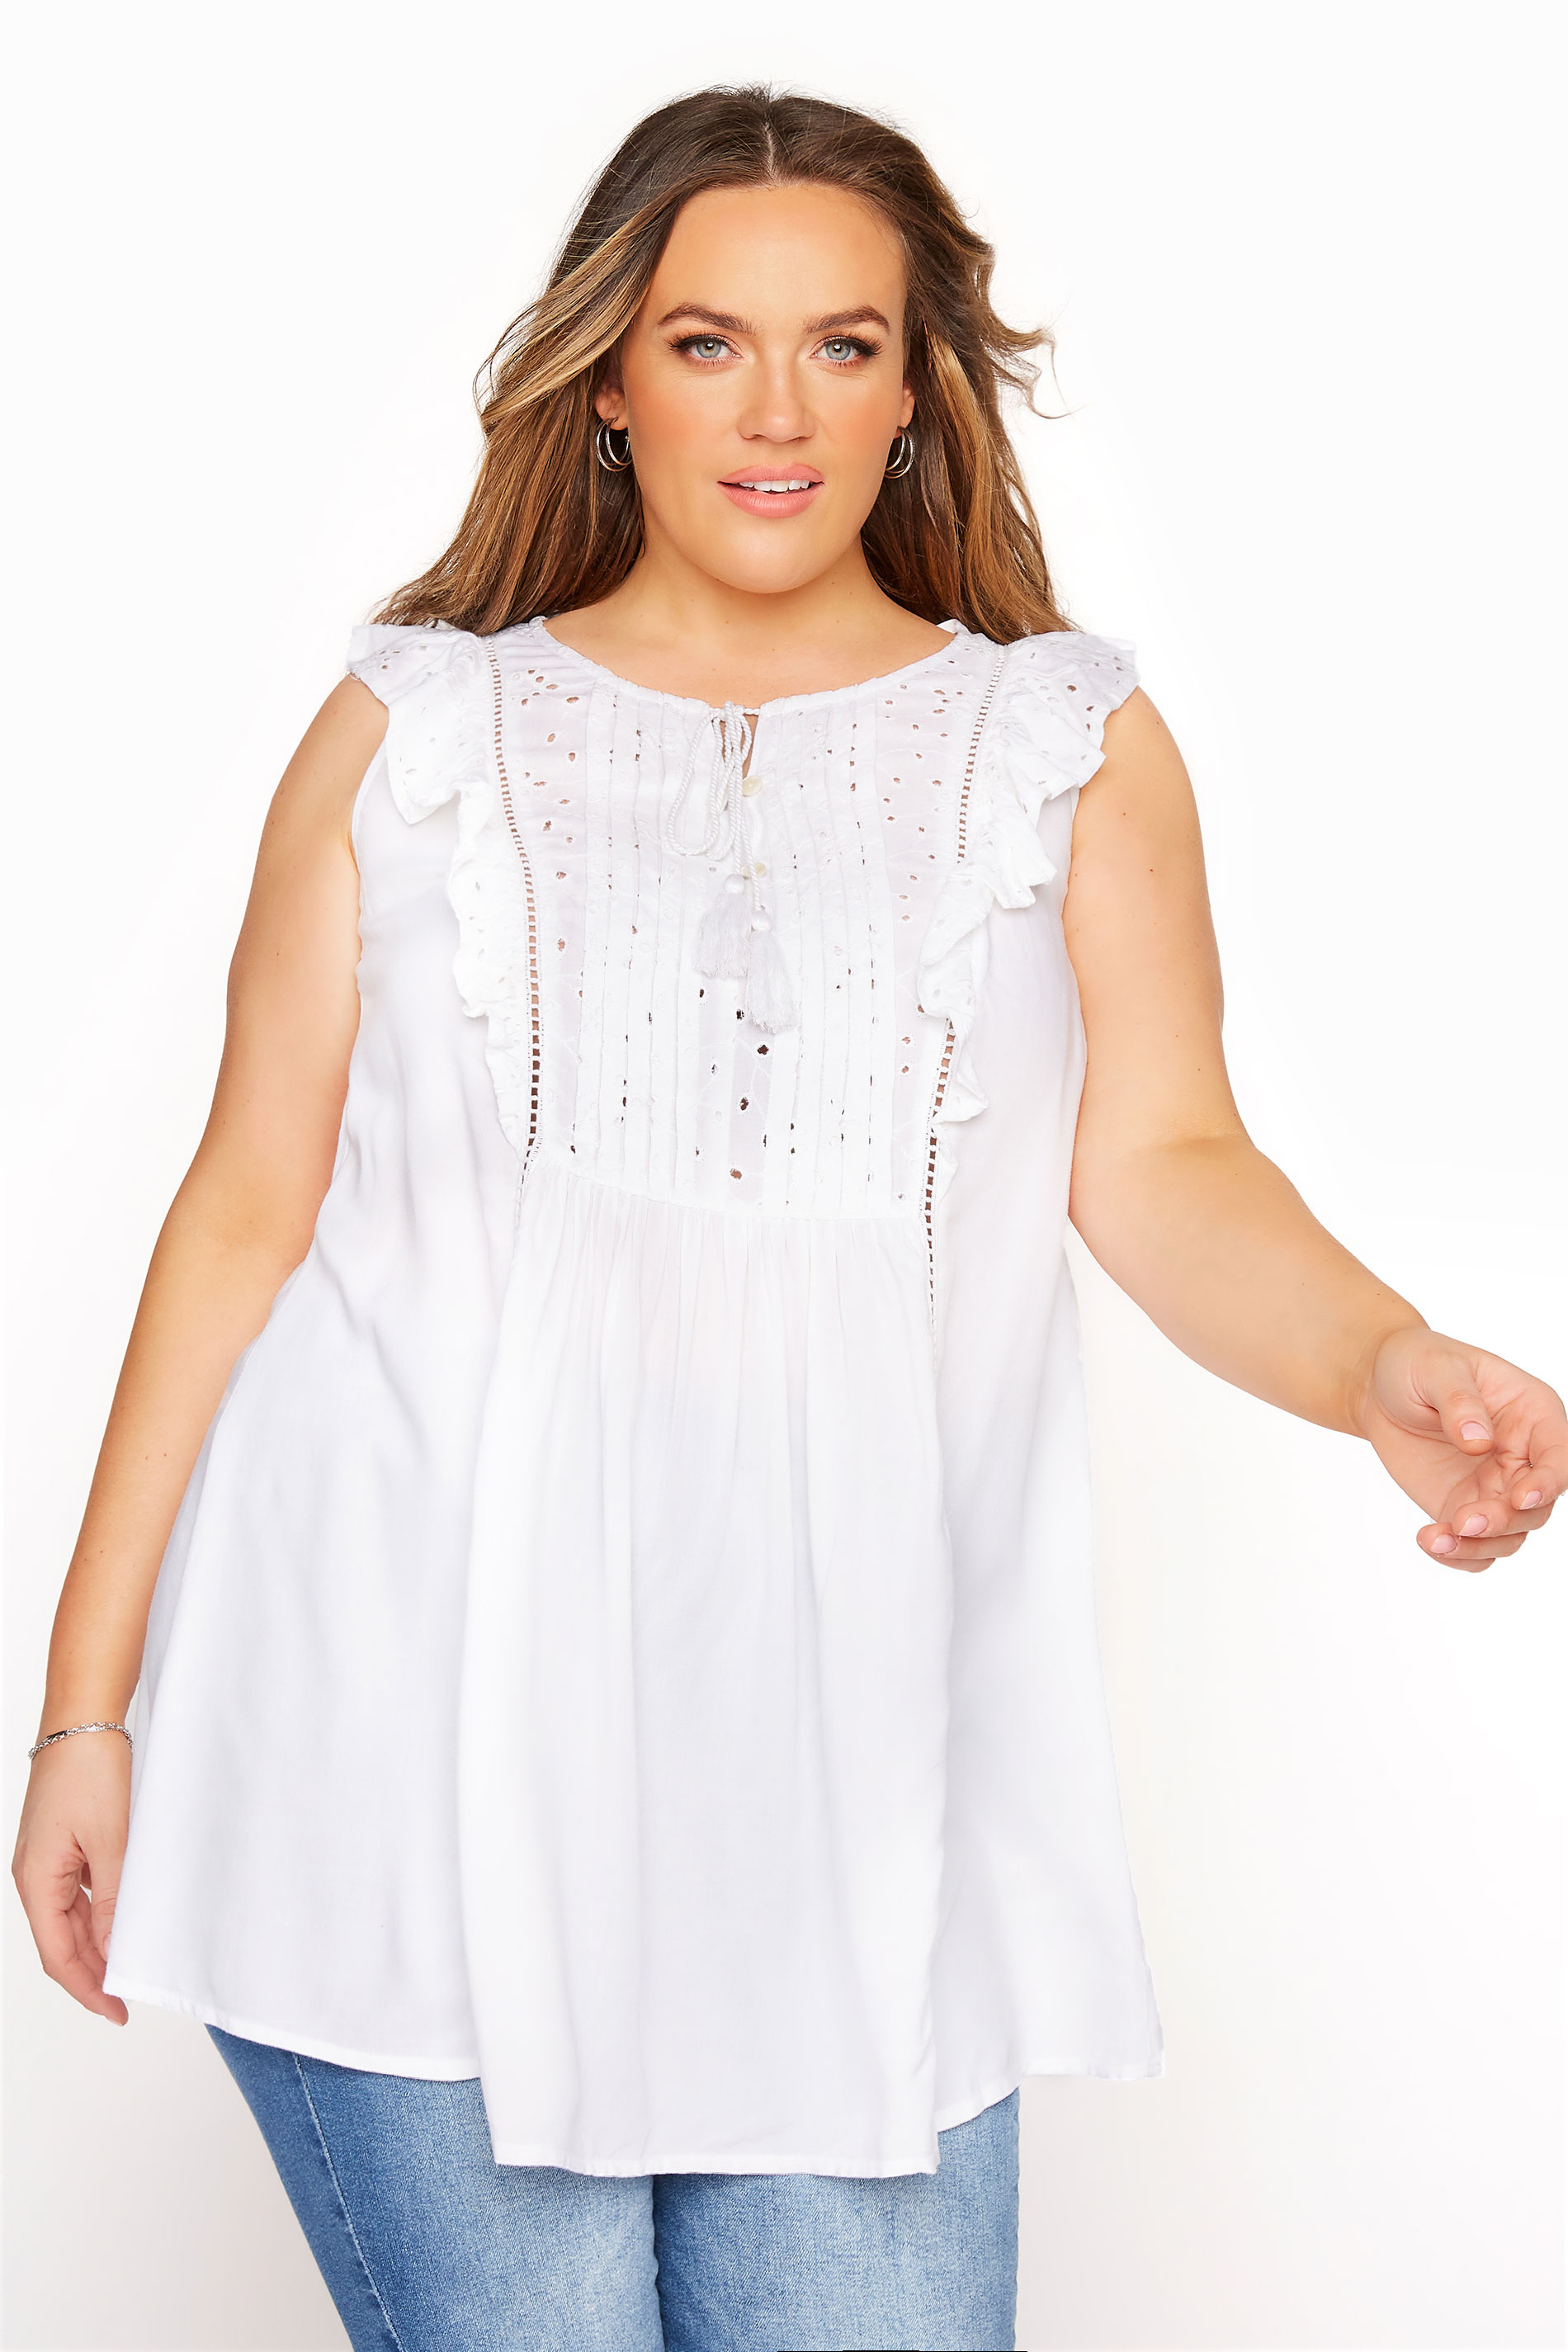 Mouwloze blouse met broderie en ruches in wit